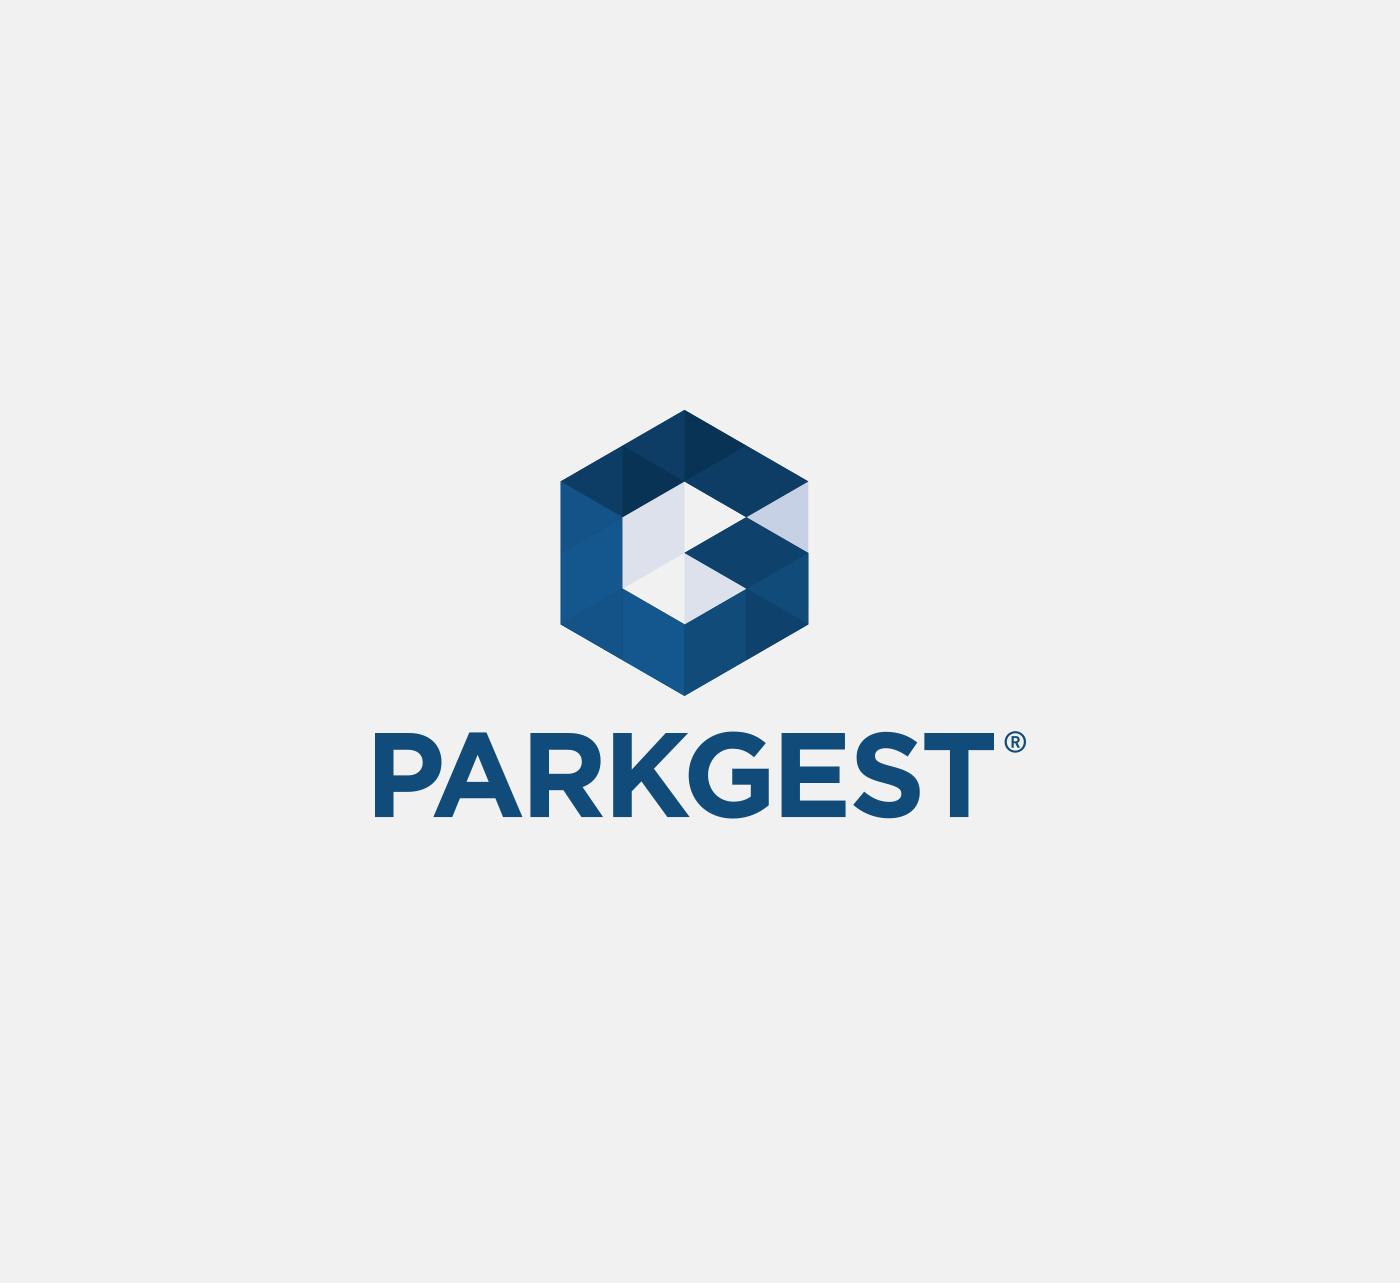 parkgest-geneva-graphicdesign-logo